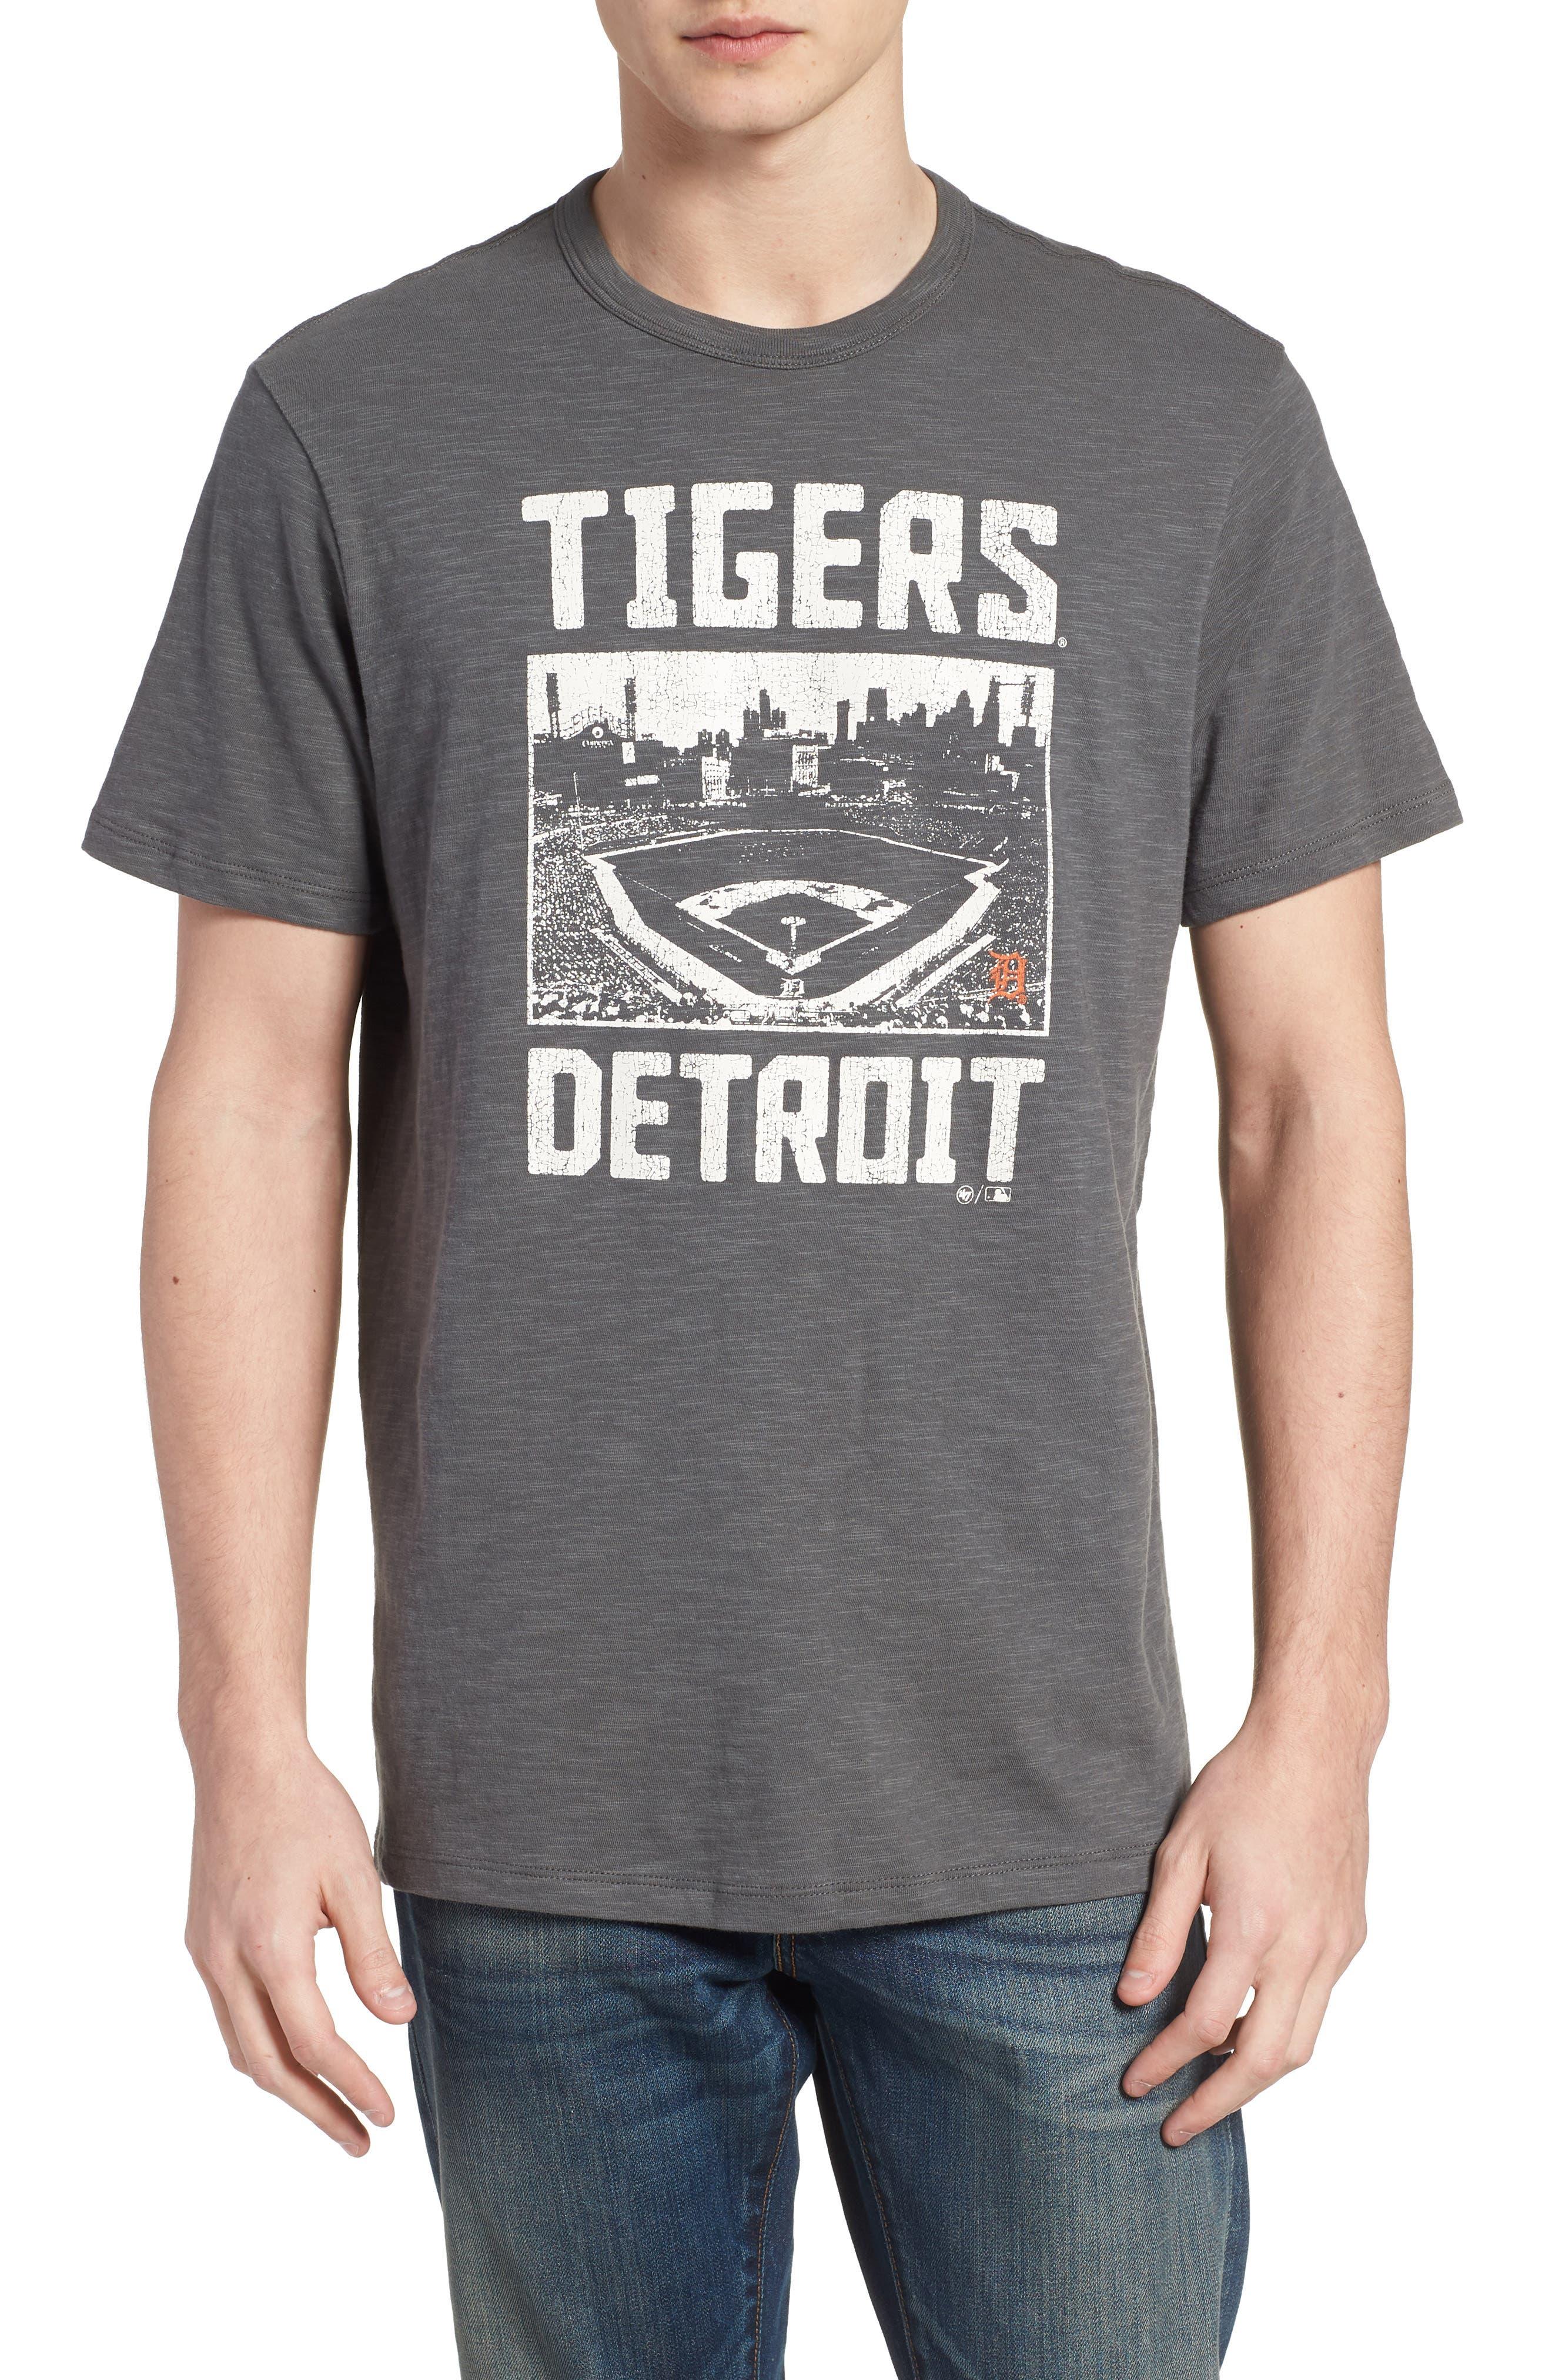 MLB Overdrive Scrum Detroit Tigers T-Shirt,                             Main thumbnail 1, color,                             020